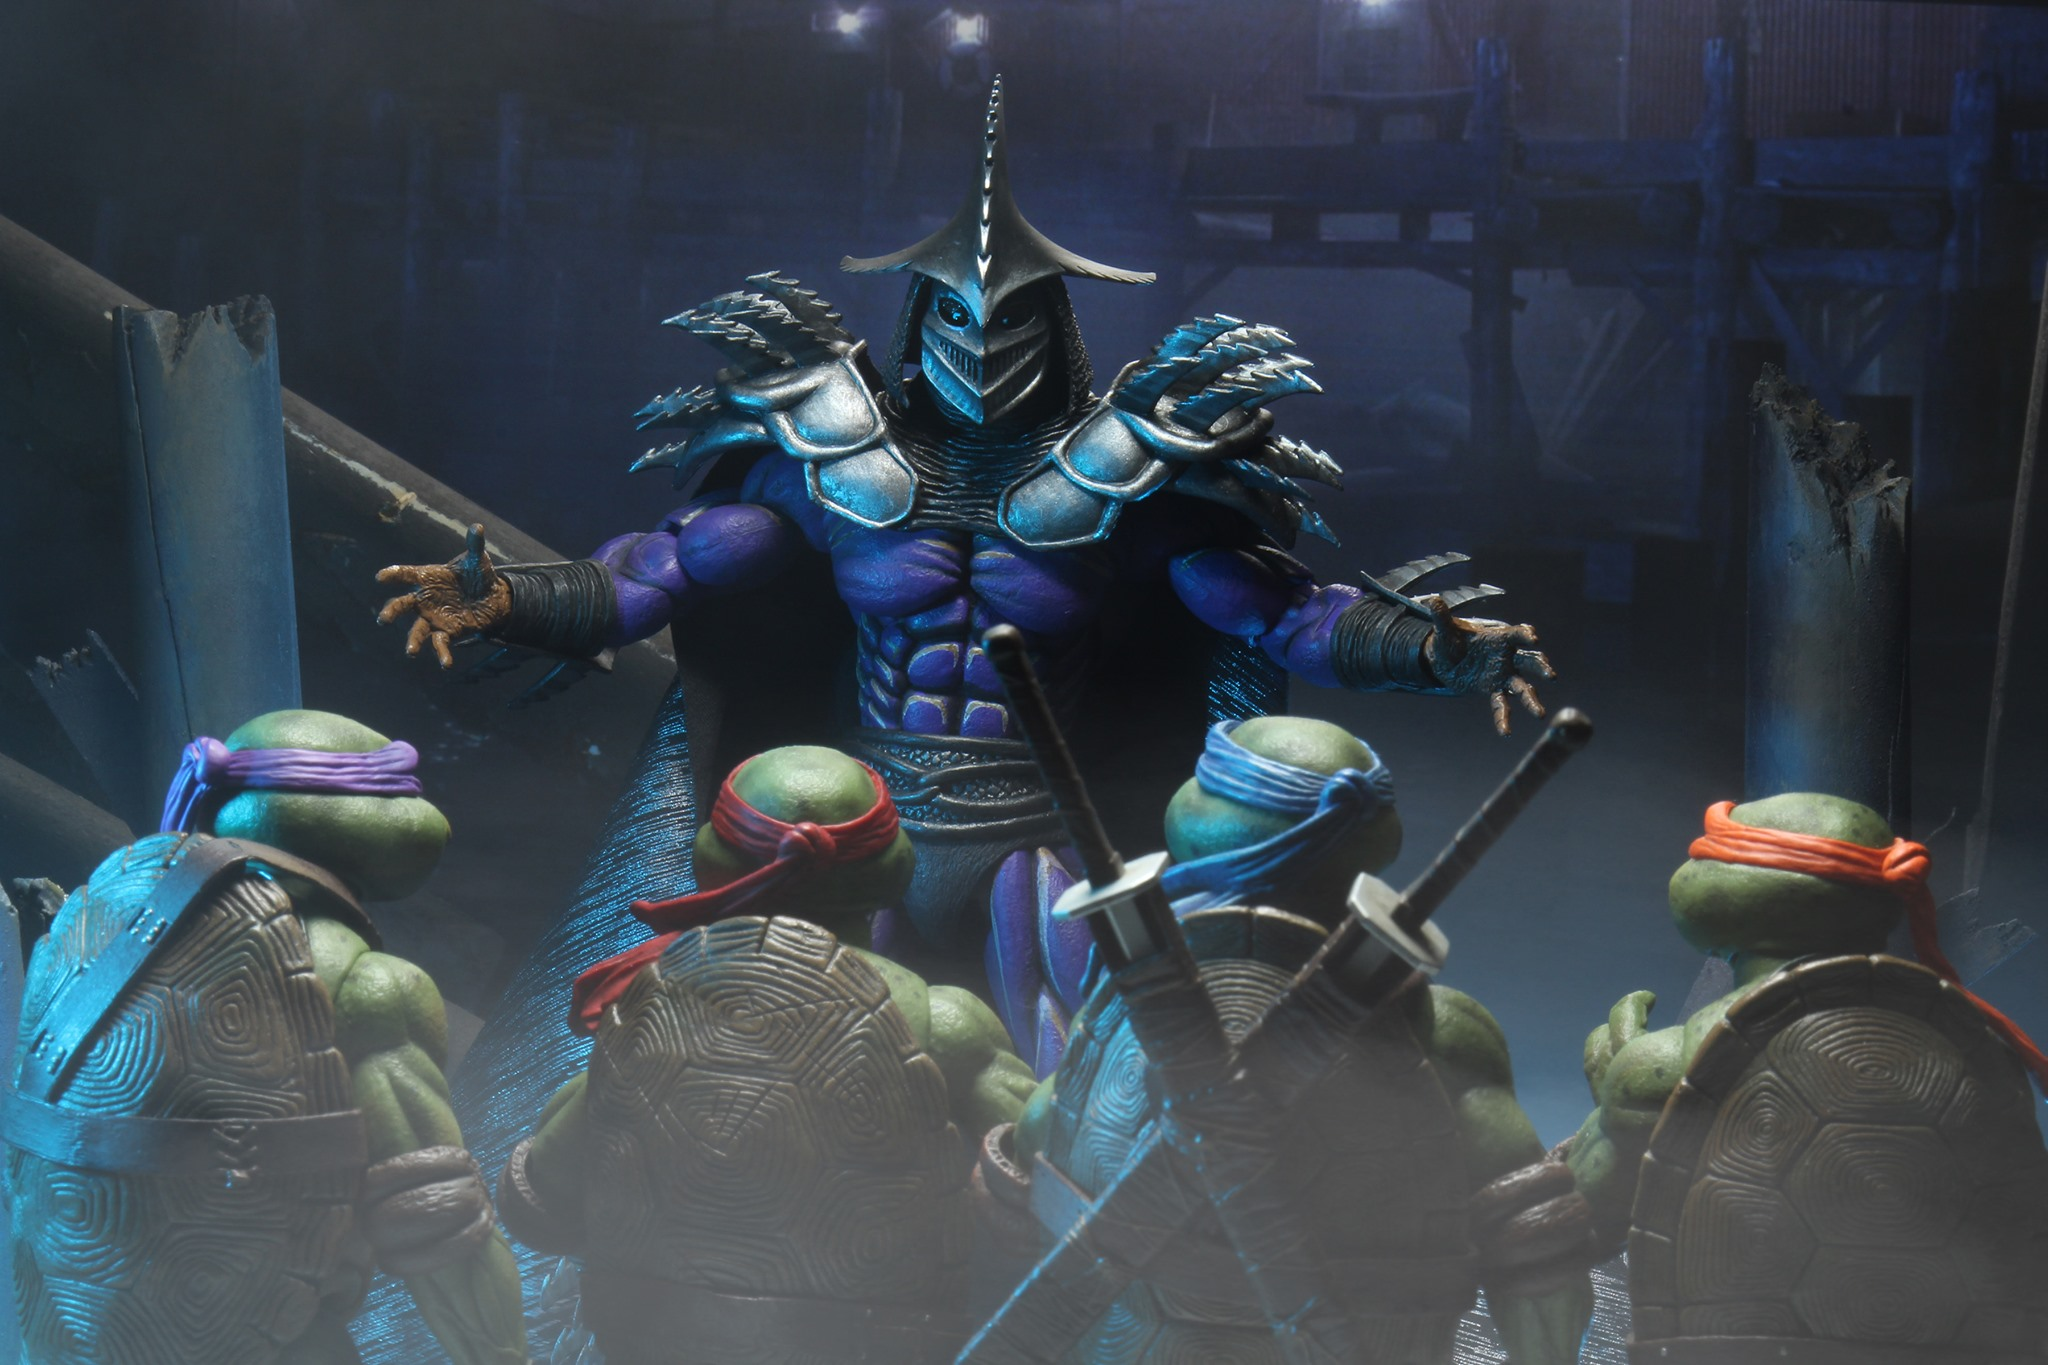 First Look | Promotional Images For NECA's Super Shredder (TMNT II)